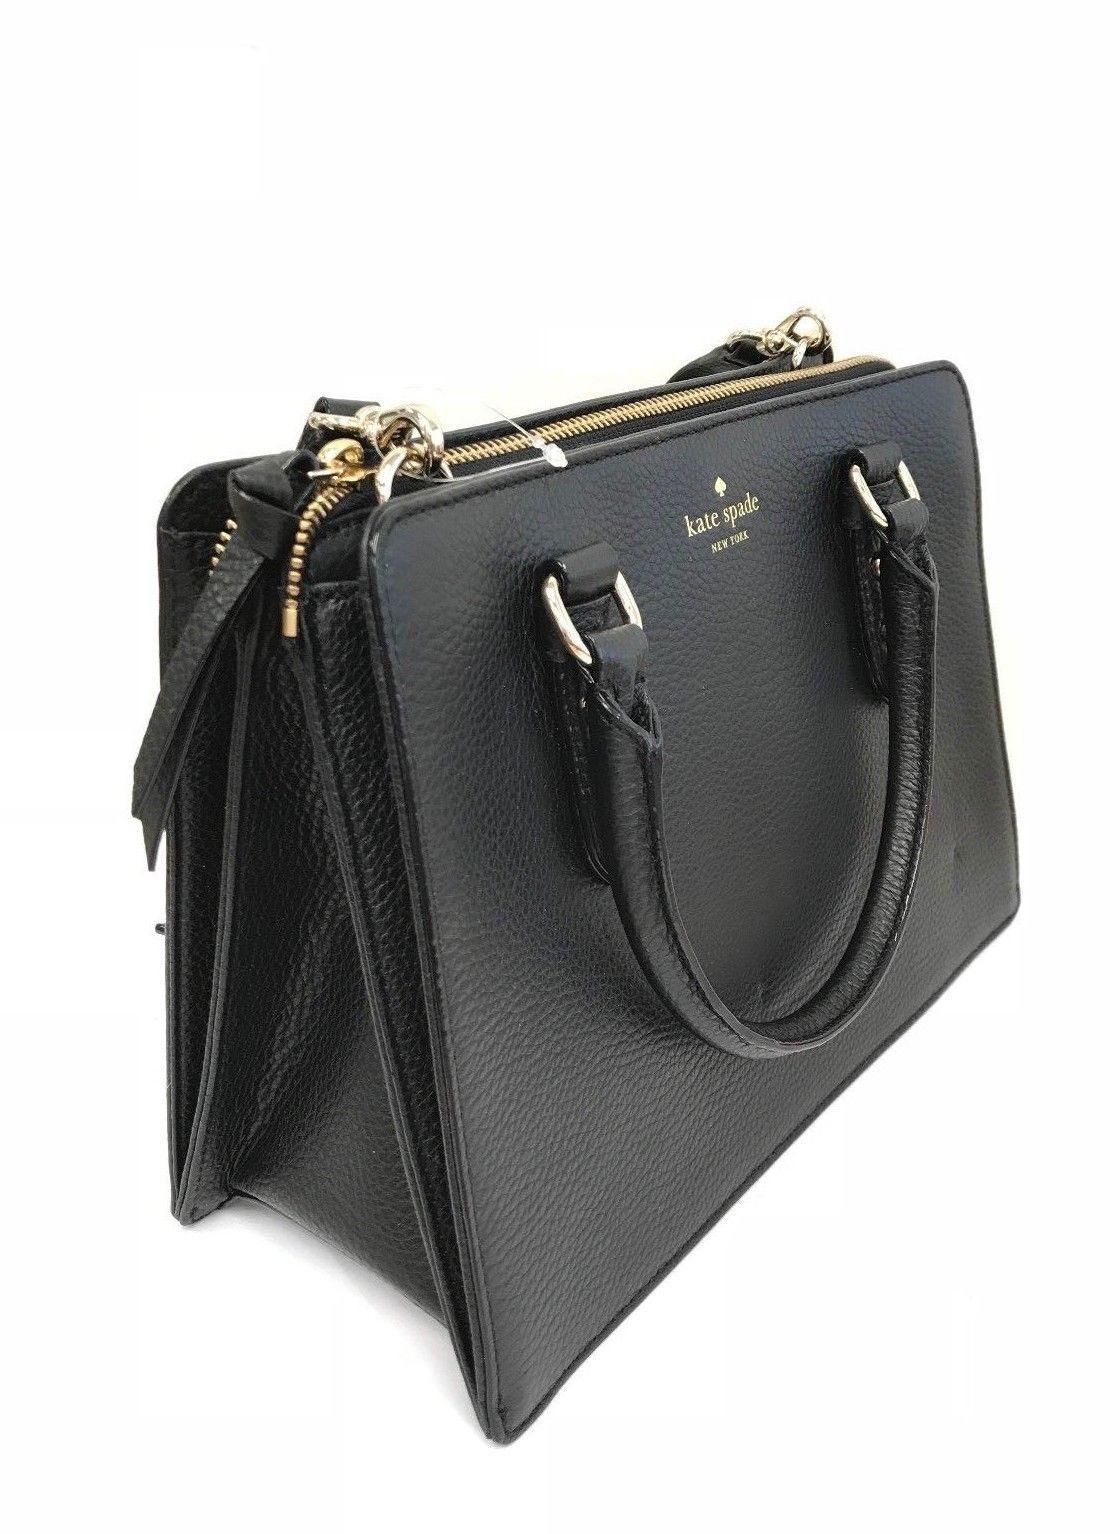 79ad7fca40 Kate Spade Mulberry Street Lise Black Leather Satchel WKRU4002 ...